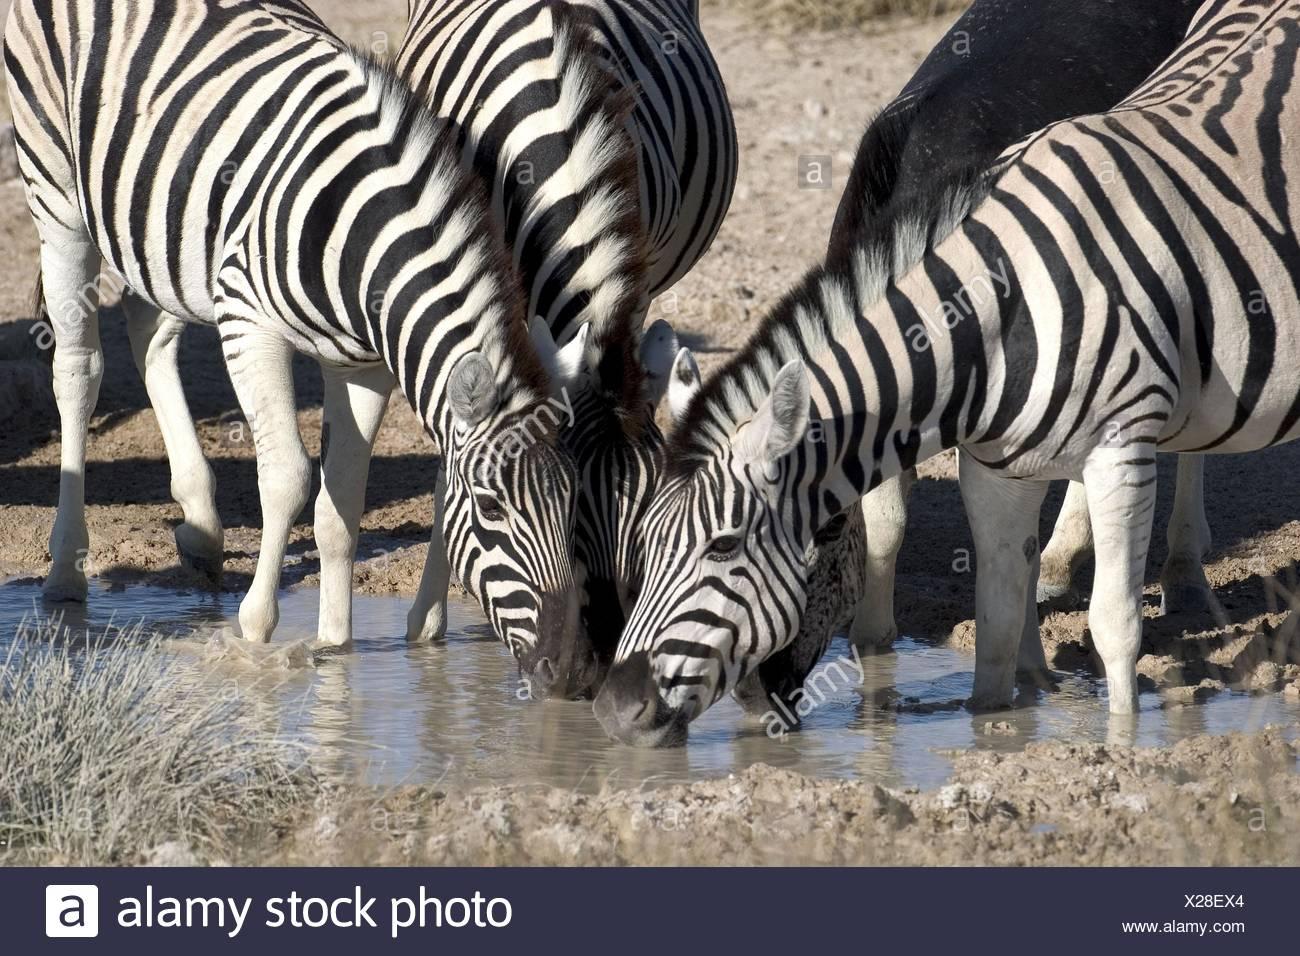 drinking zebras - Stock Image